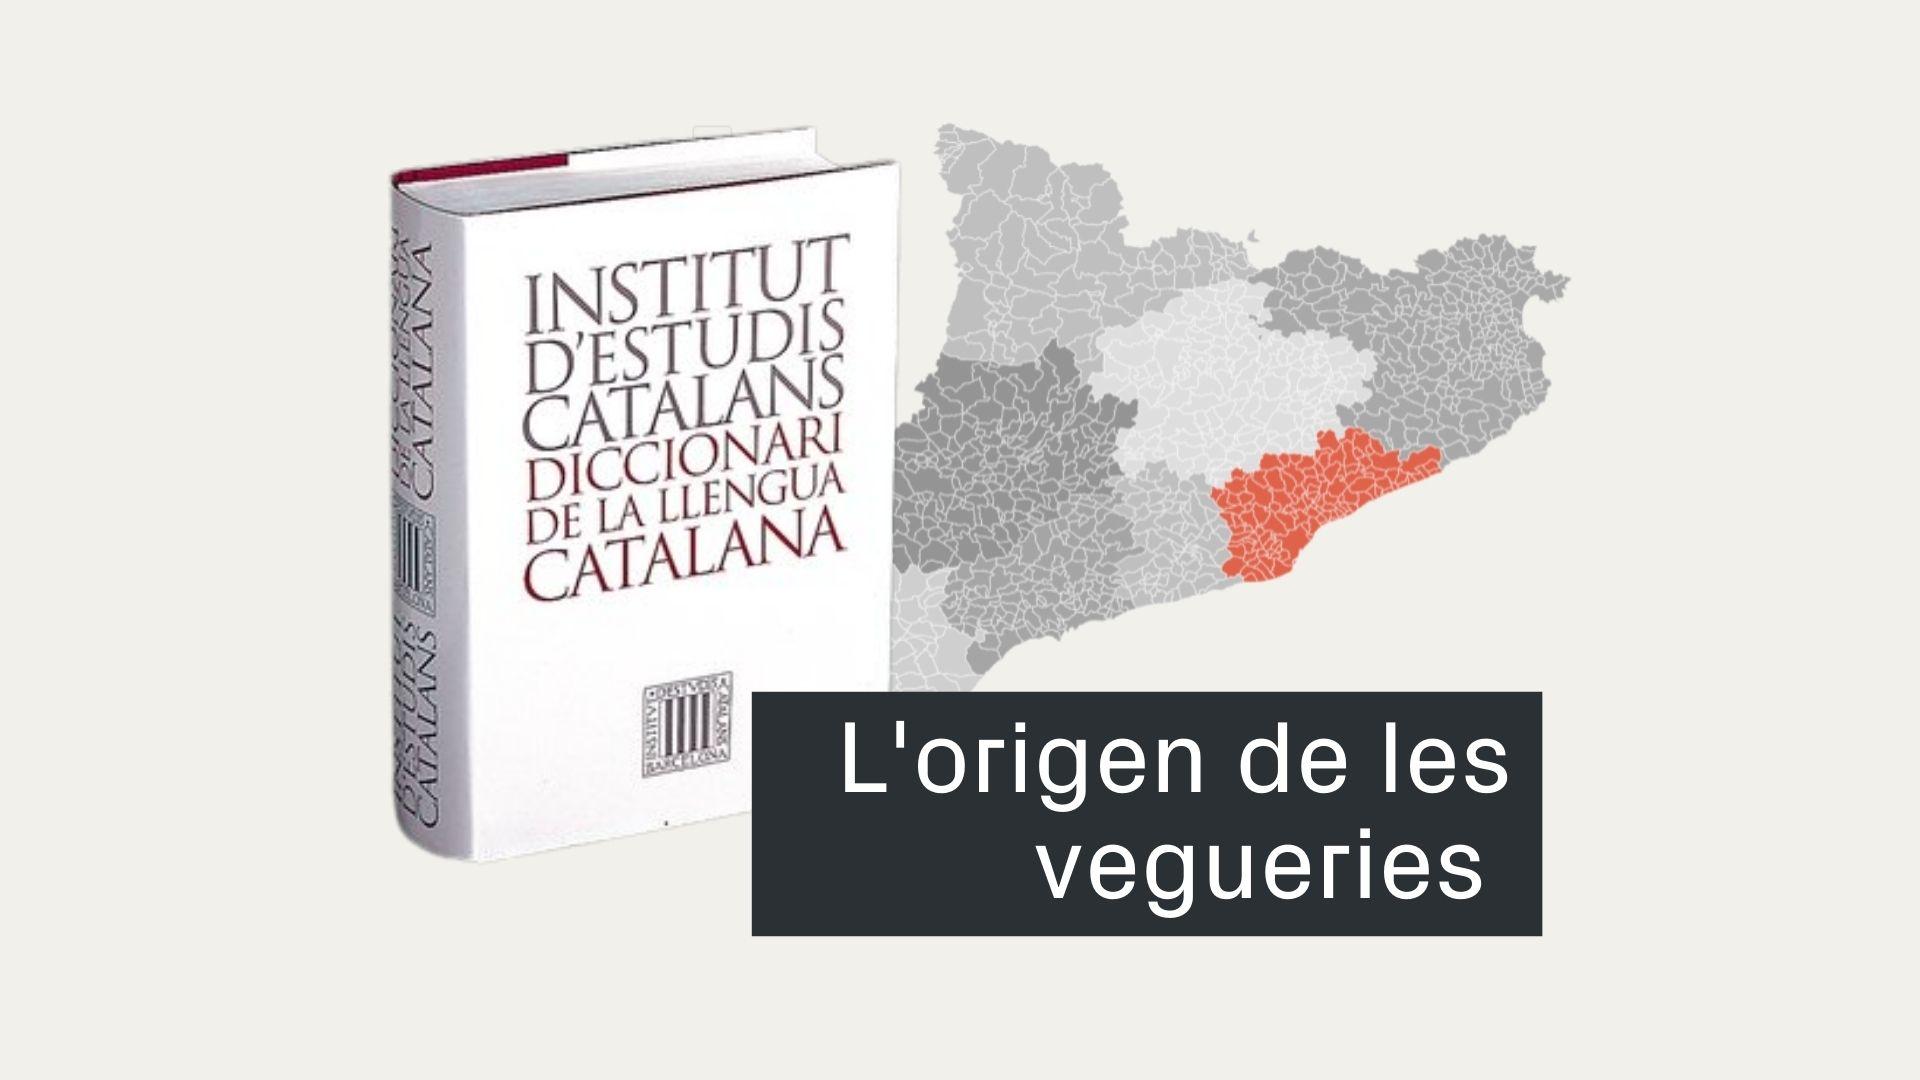 origen de les vegueries de Catalunya